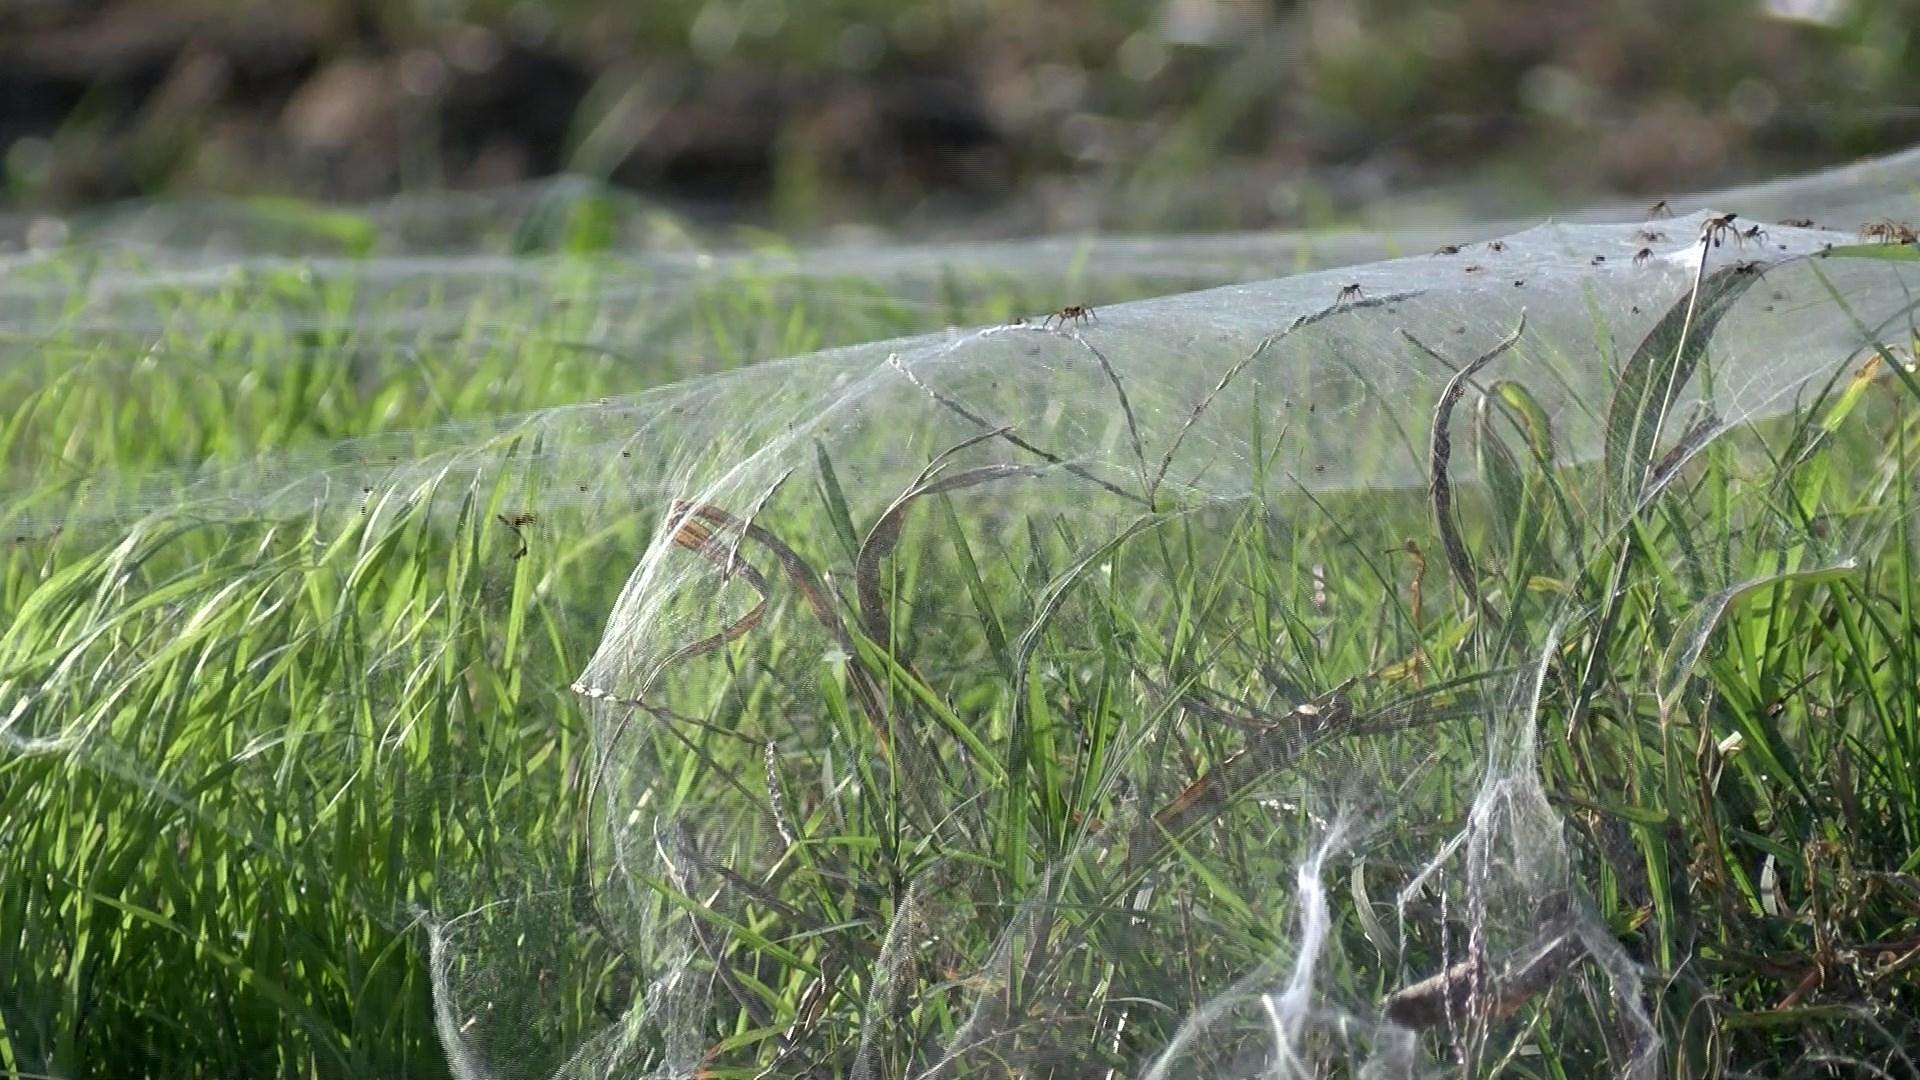 memphis spider, memphis spider november 2015, millions of spiders invade memphis, spiders infest memphis, memphis spiders problems, memphis spider plague